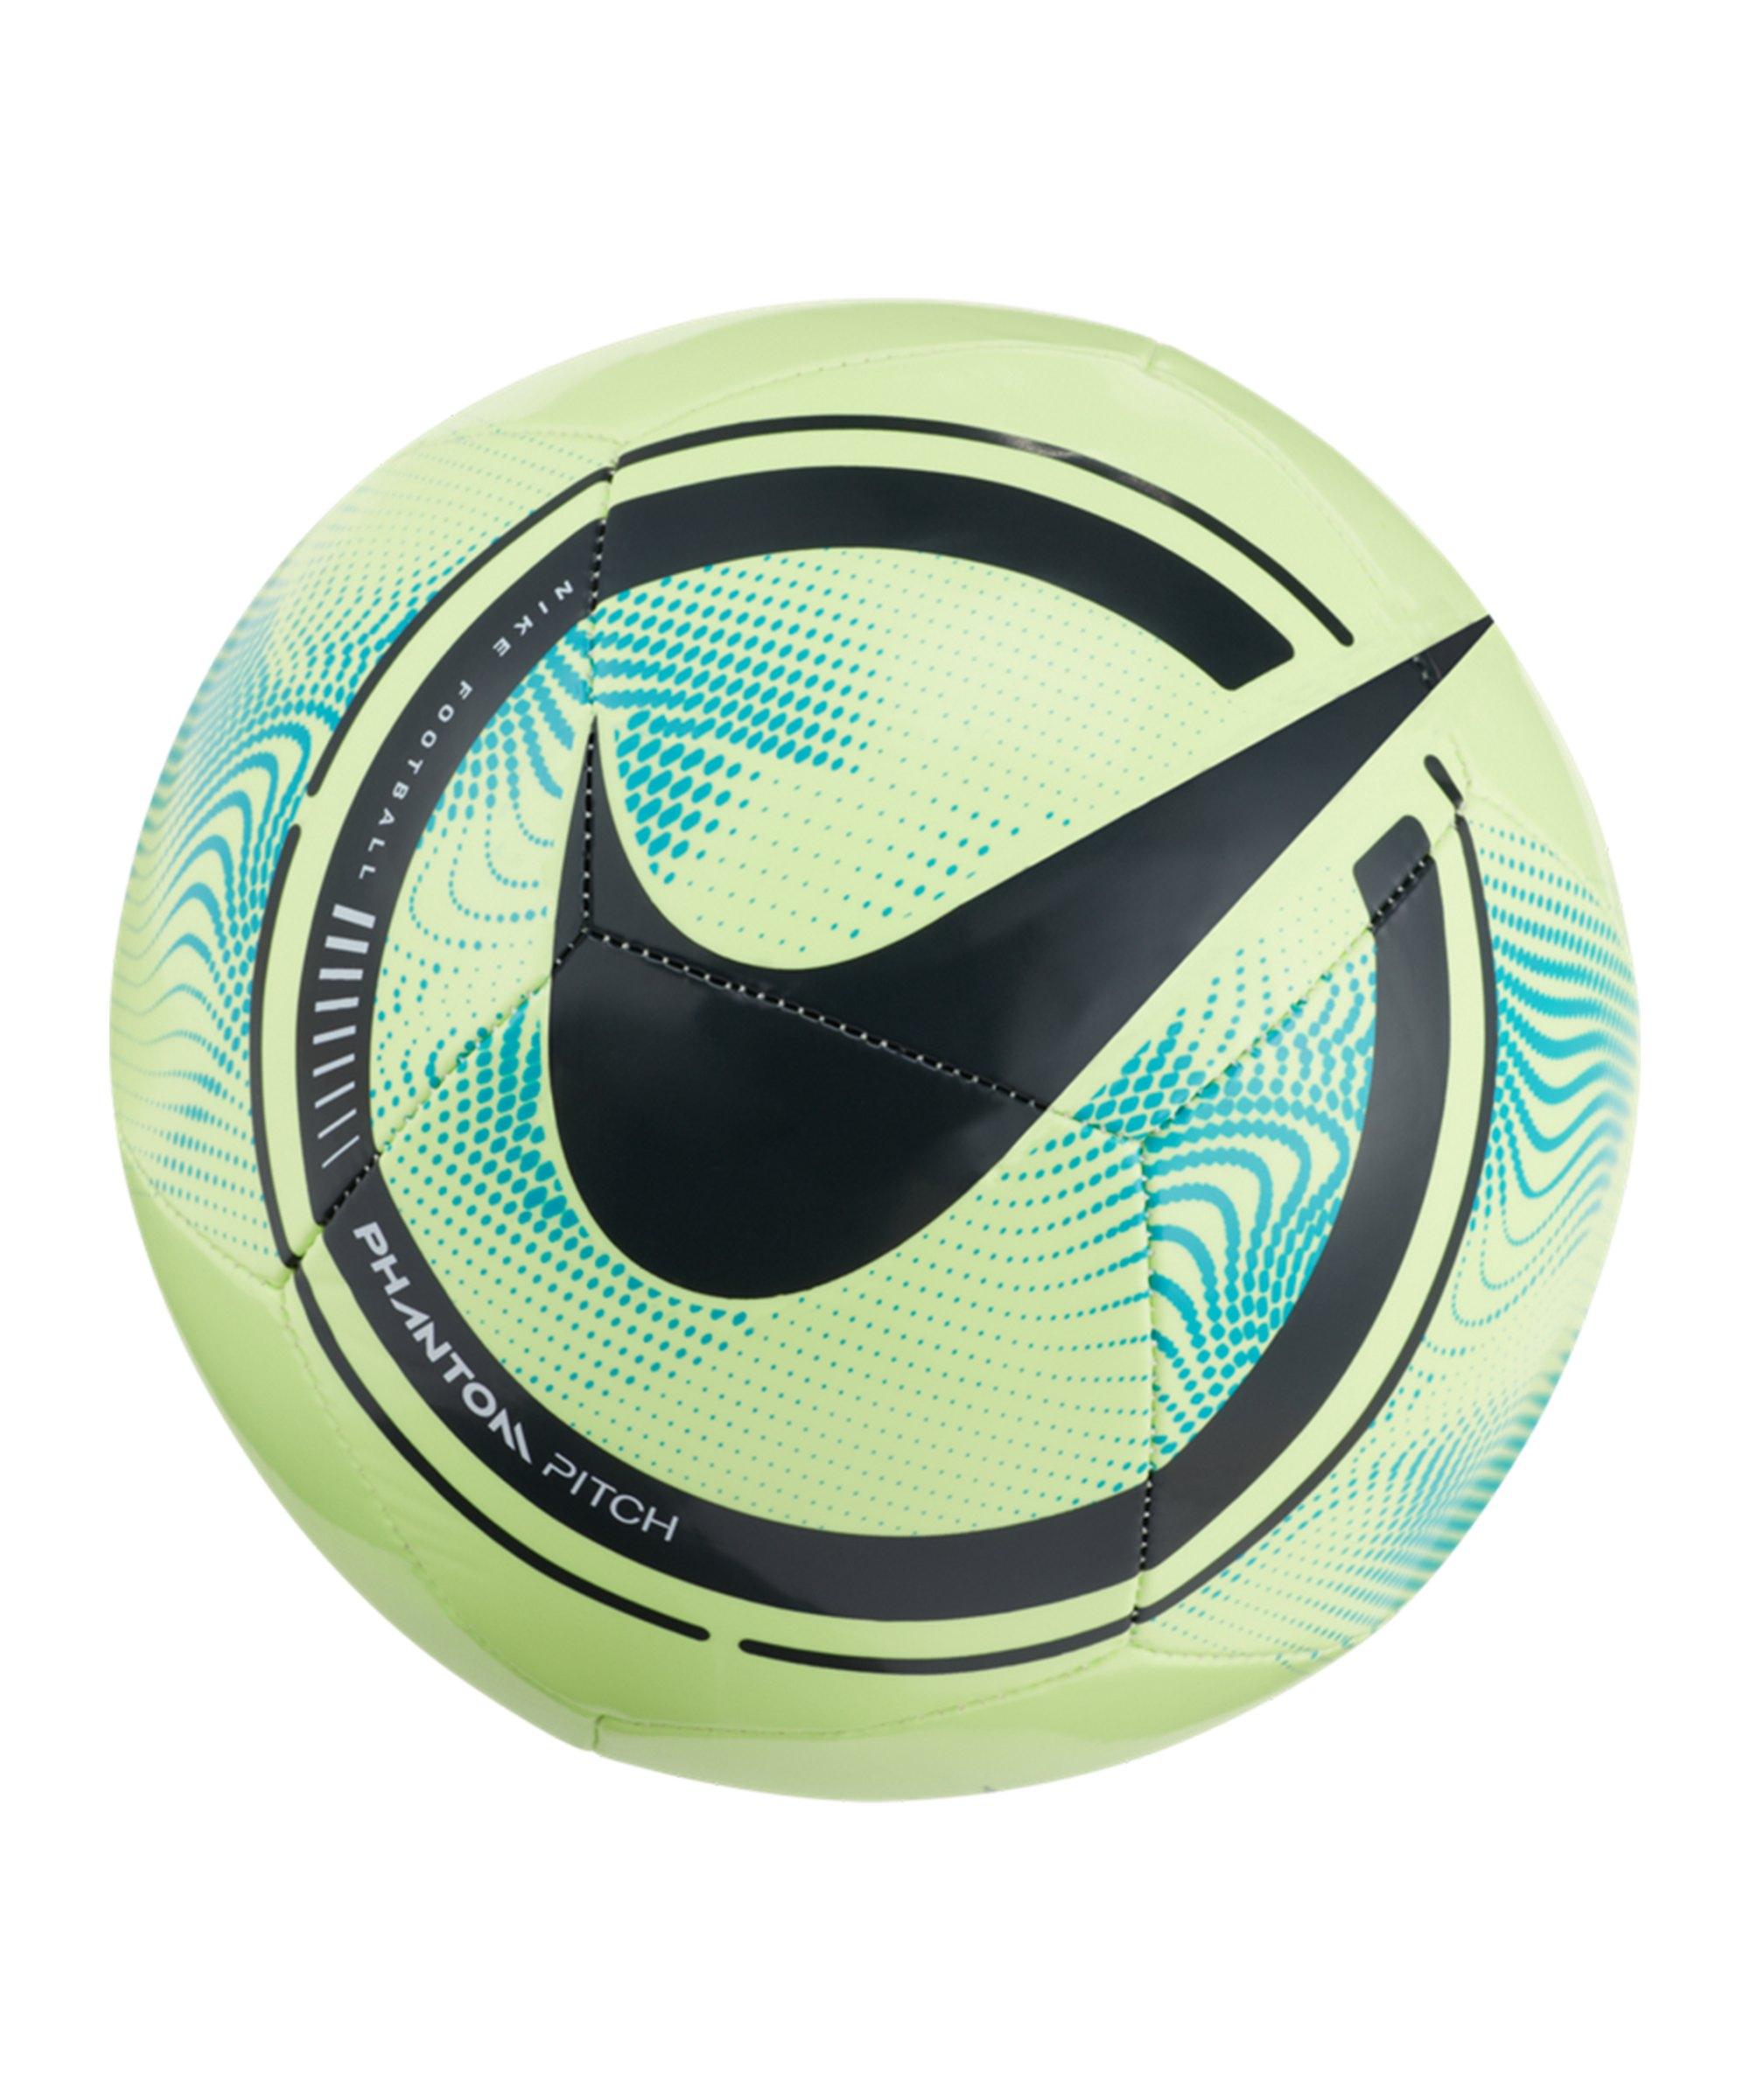 Nike Phantom Trainingsball Grün Schwarz F345 - gruen